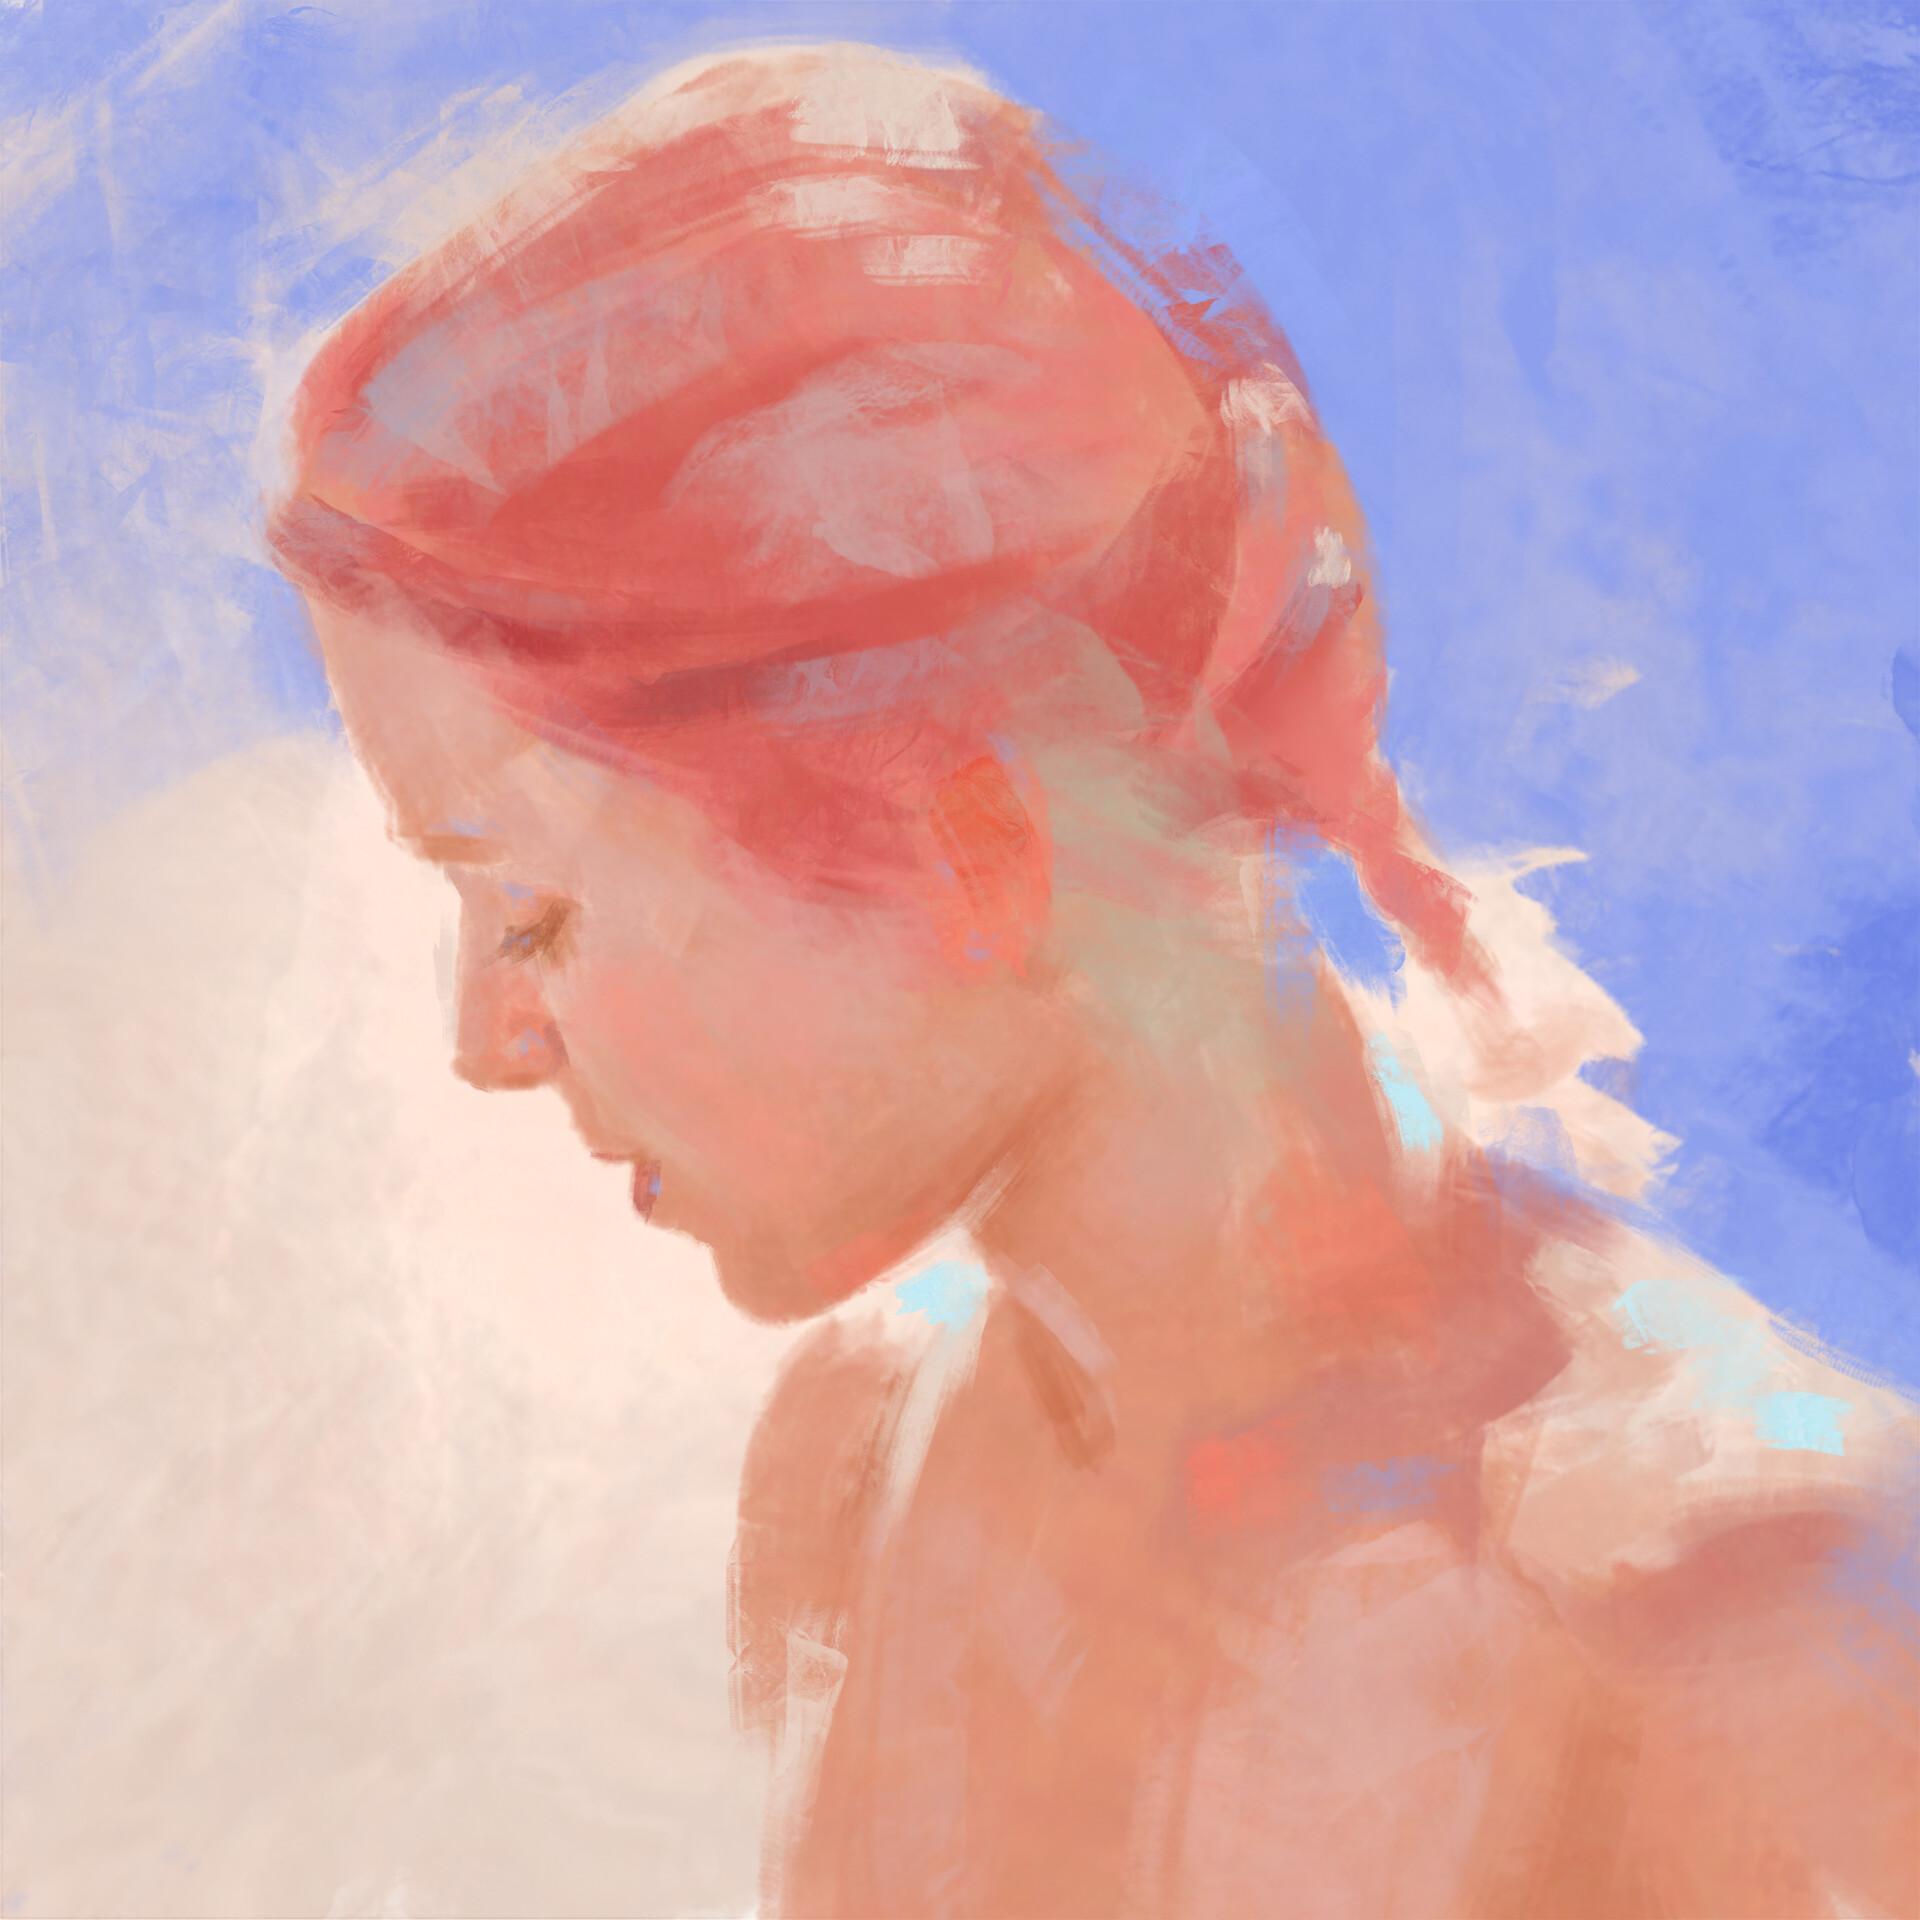 Ariel anabitarte deb